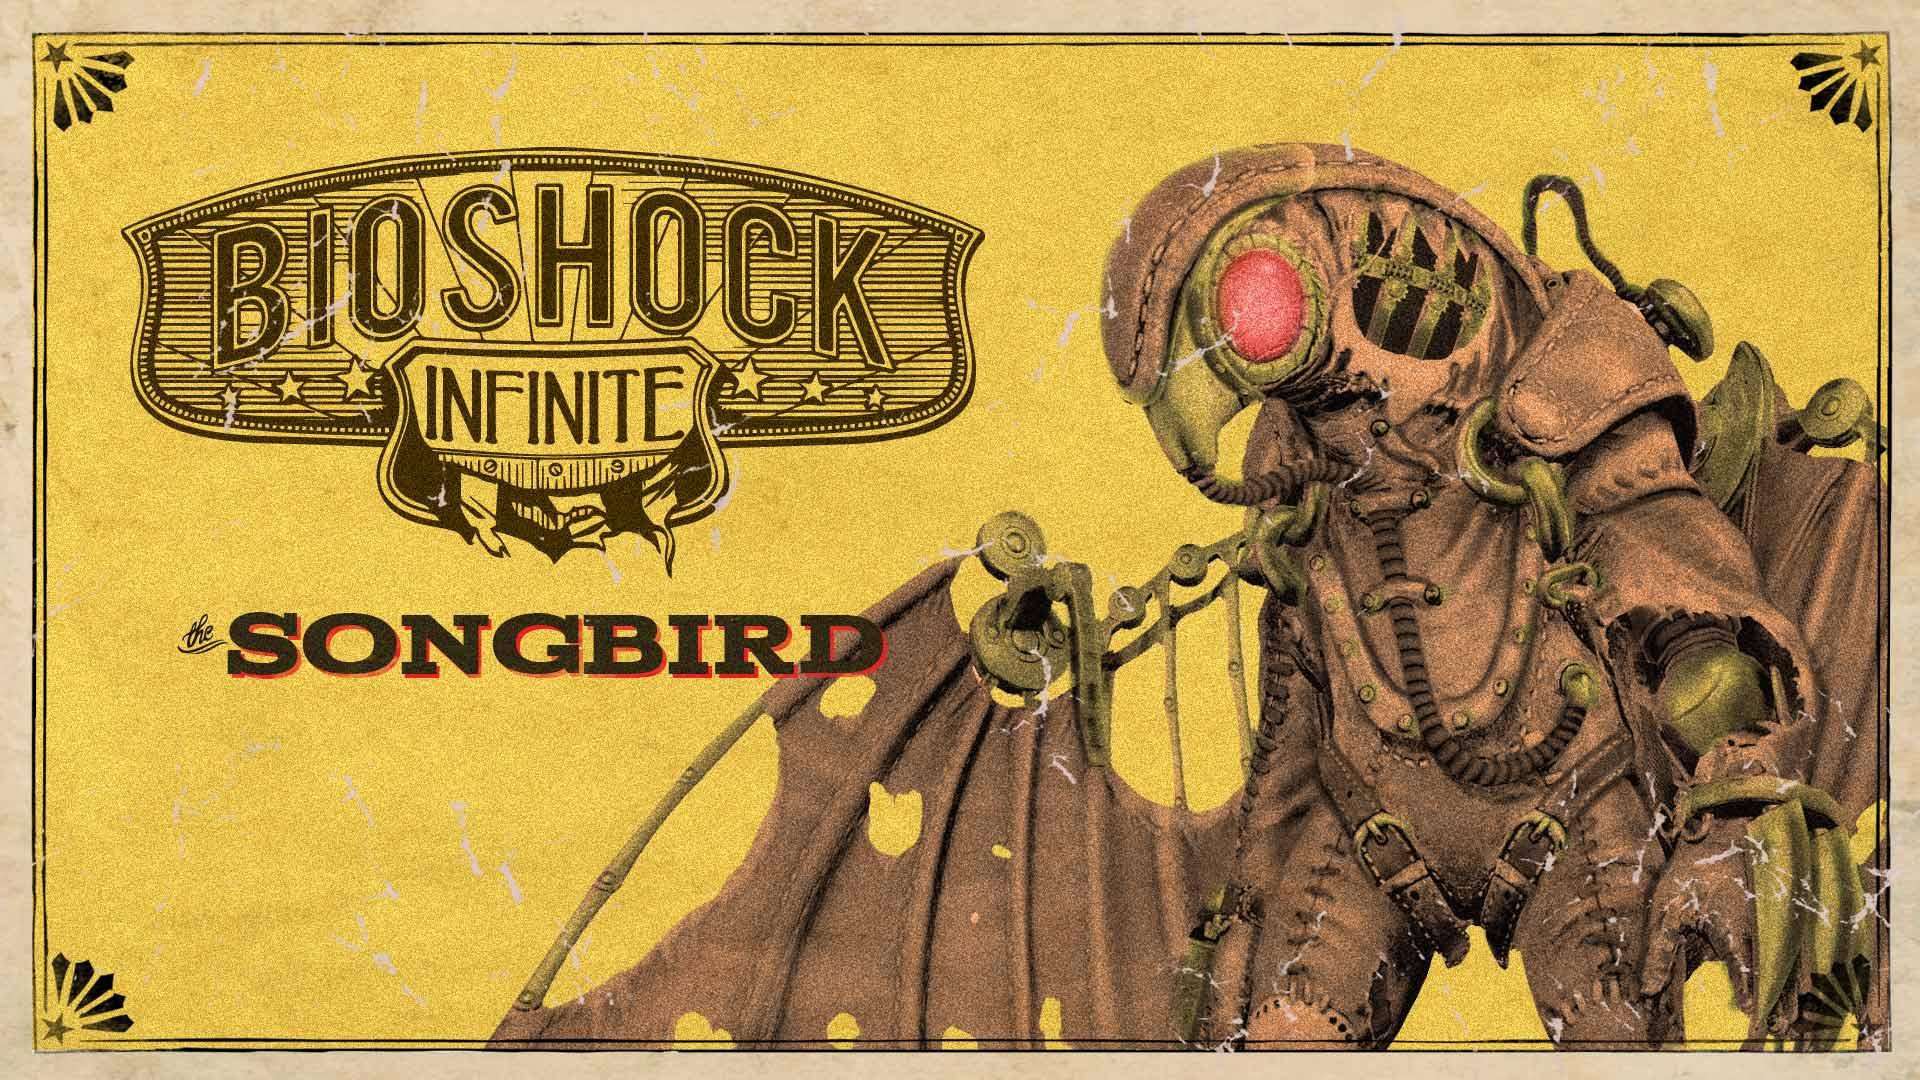 Bioshock infinite songbird steam trading cards wiki - Bioshock wikia ...